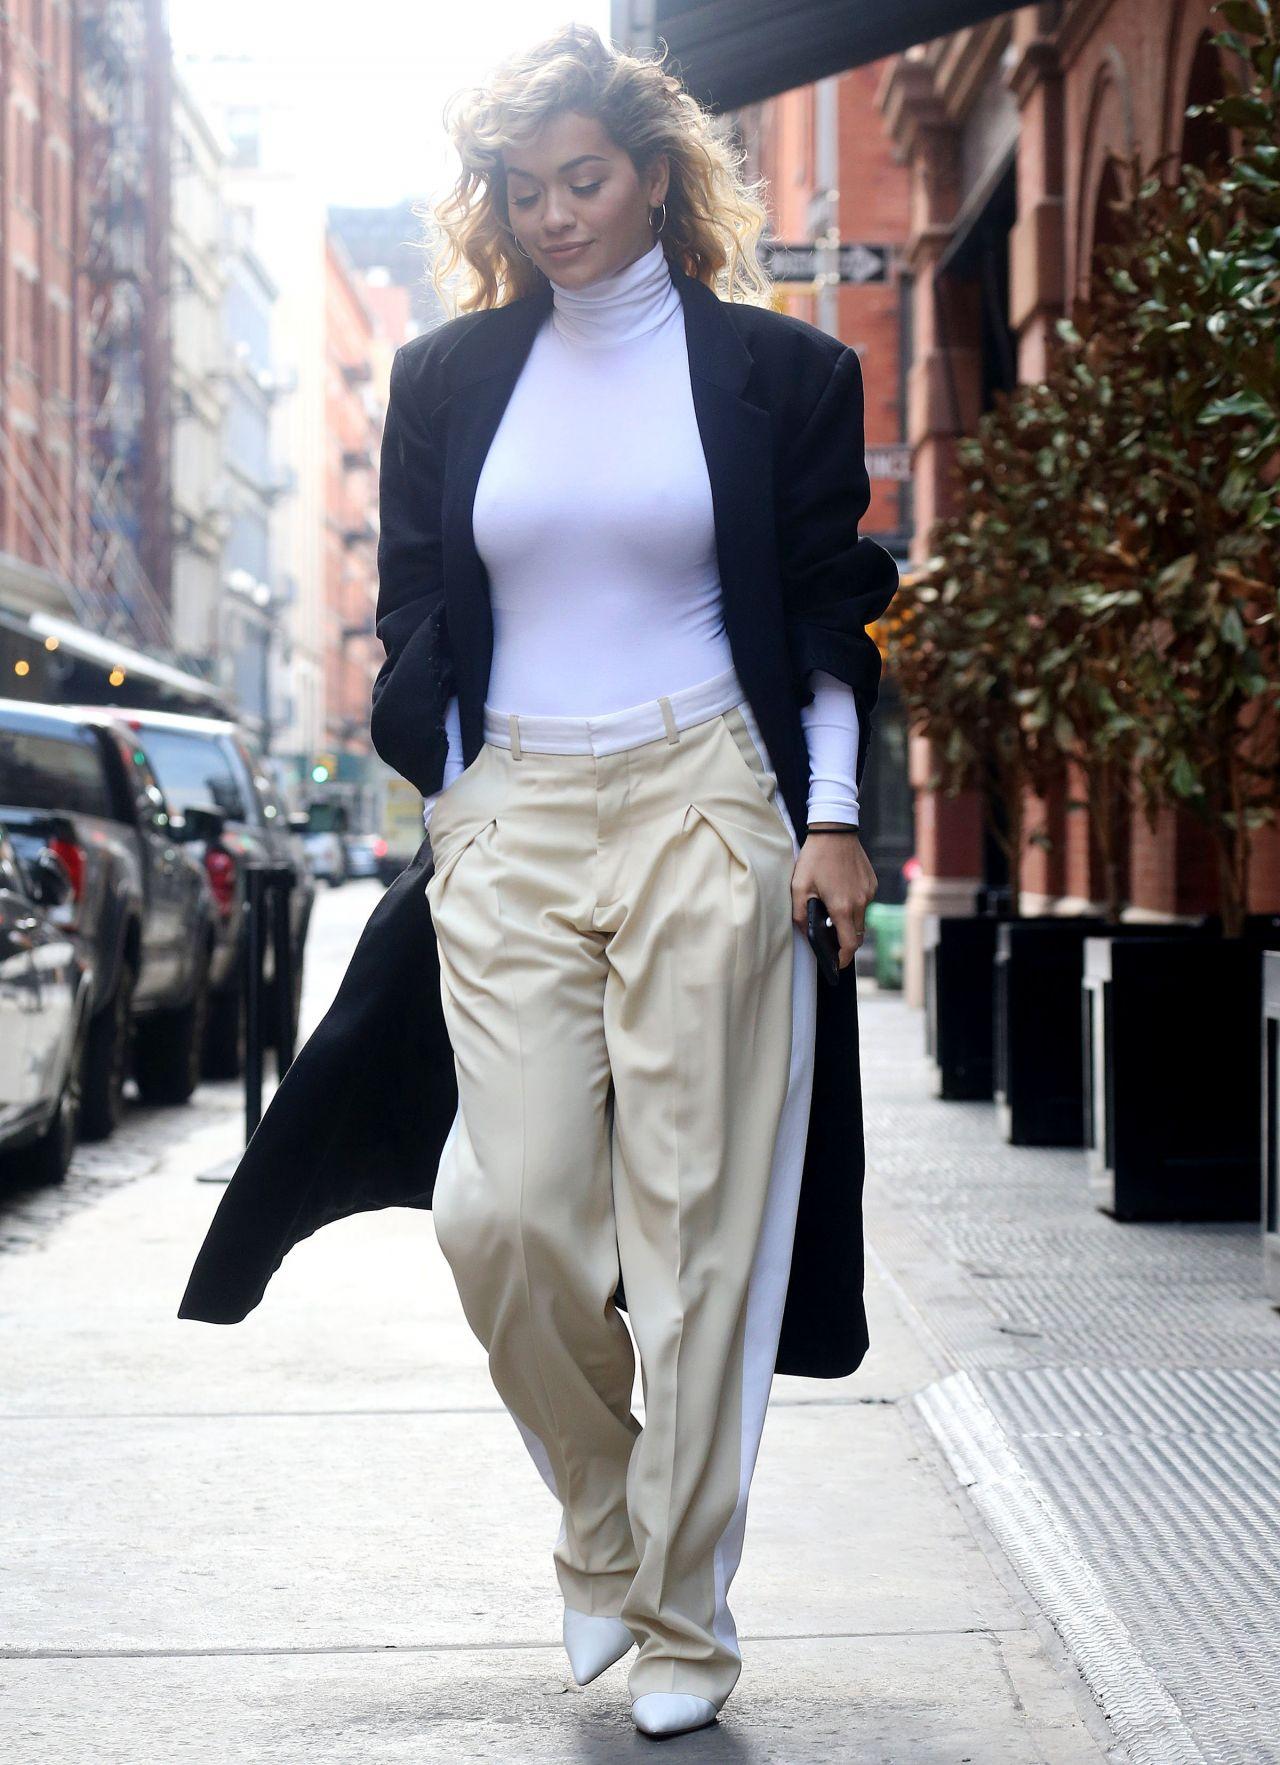 http://celebmafia.com/wp-content/uploads/2018/04/rita-ora-street-fashion-new-york-city-04-10-2018-8.jpg